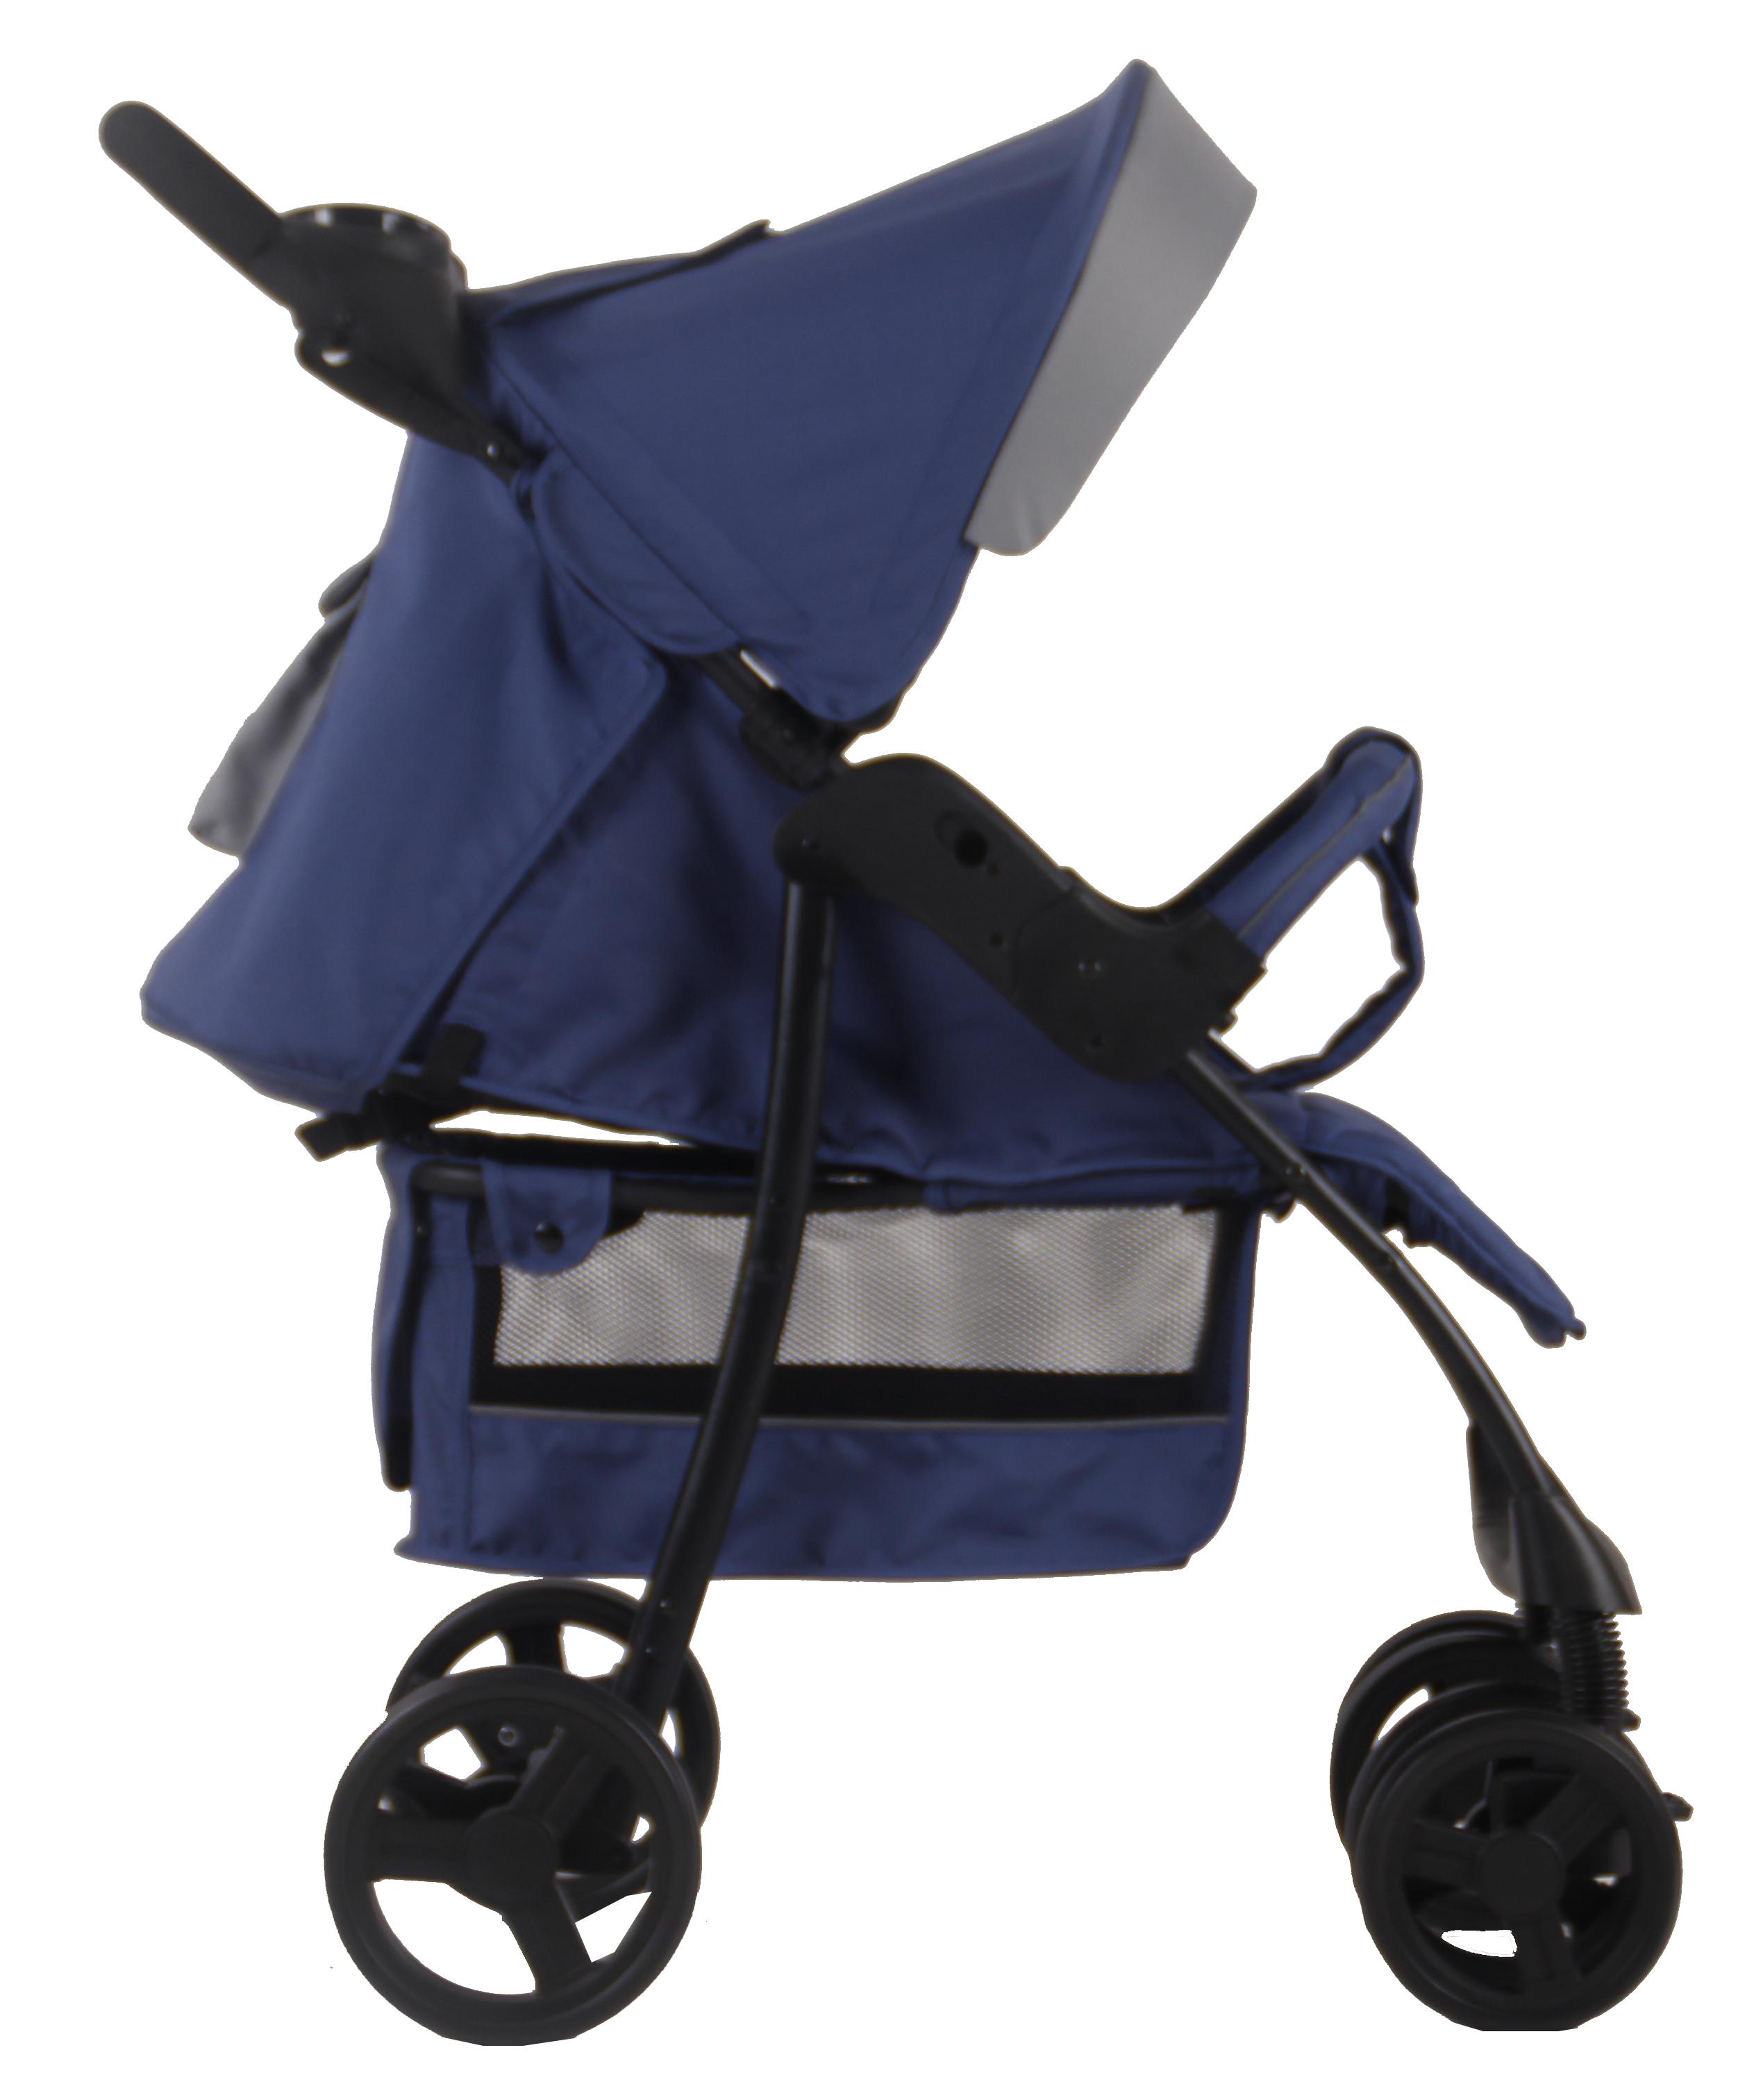 Купить Коляски прогулочные, Коляска прогулочная Parusok «Jogger Pro» синяя, Канада, синий